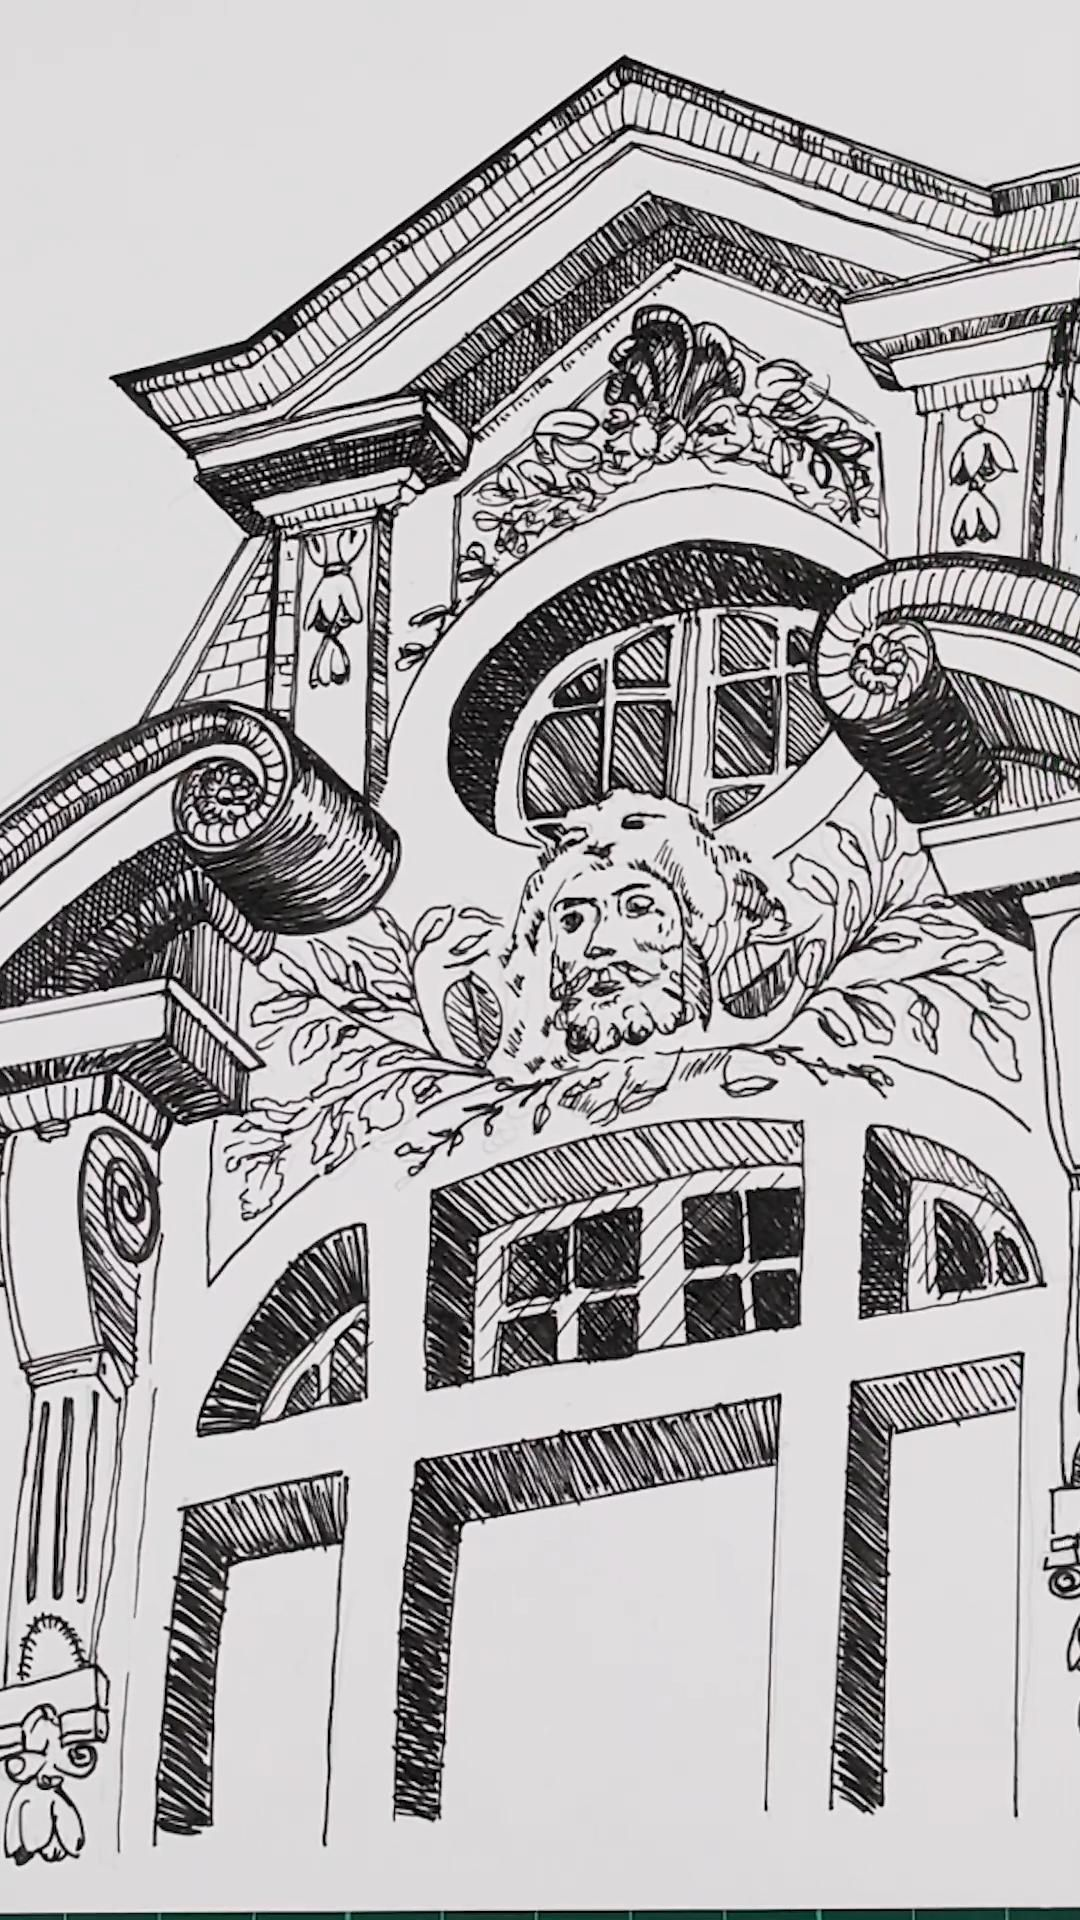 Architectural Sketching of Paris